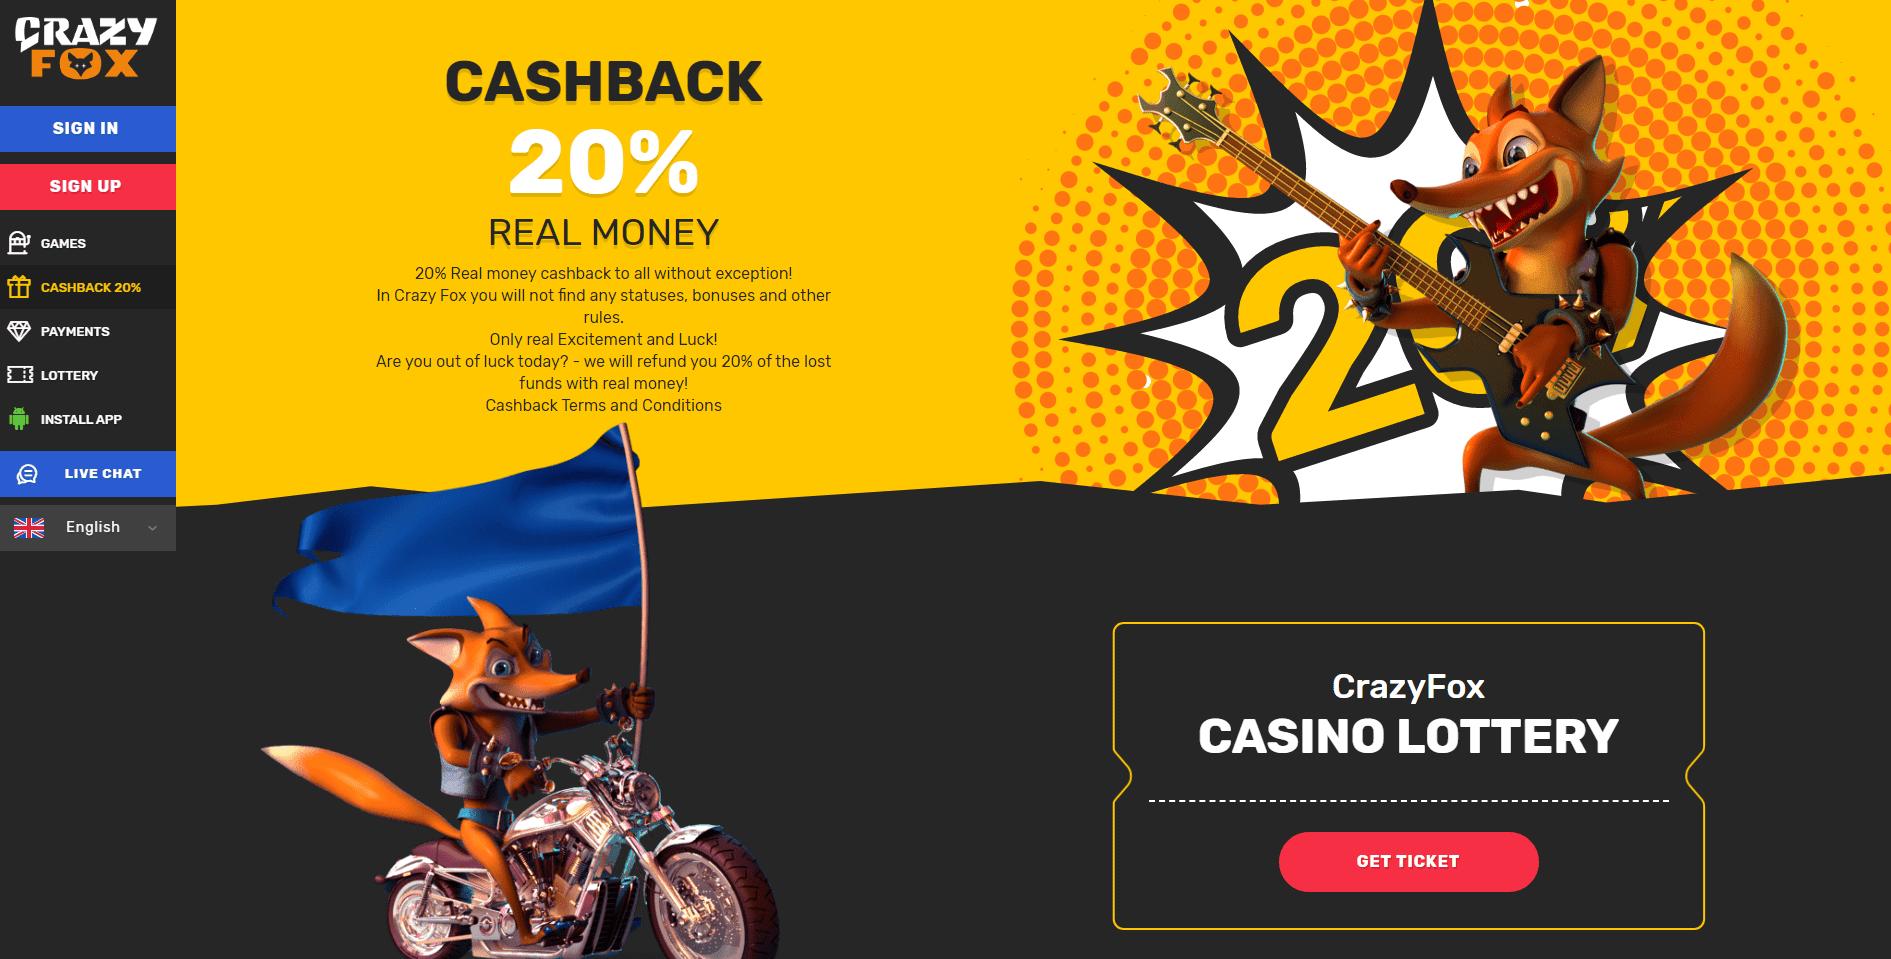 Glücksspielautomaten gewinnchance